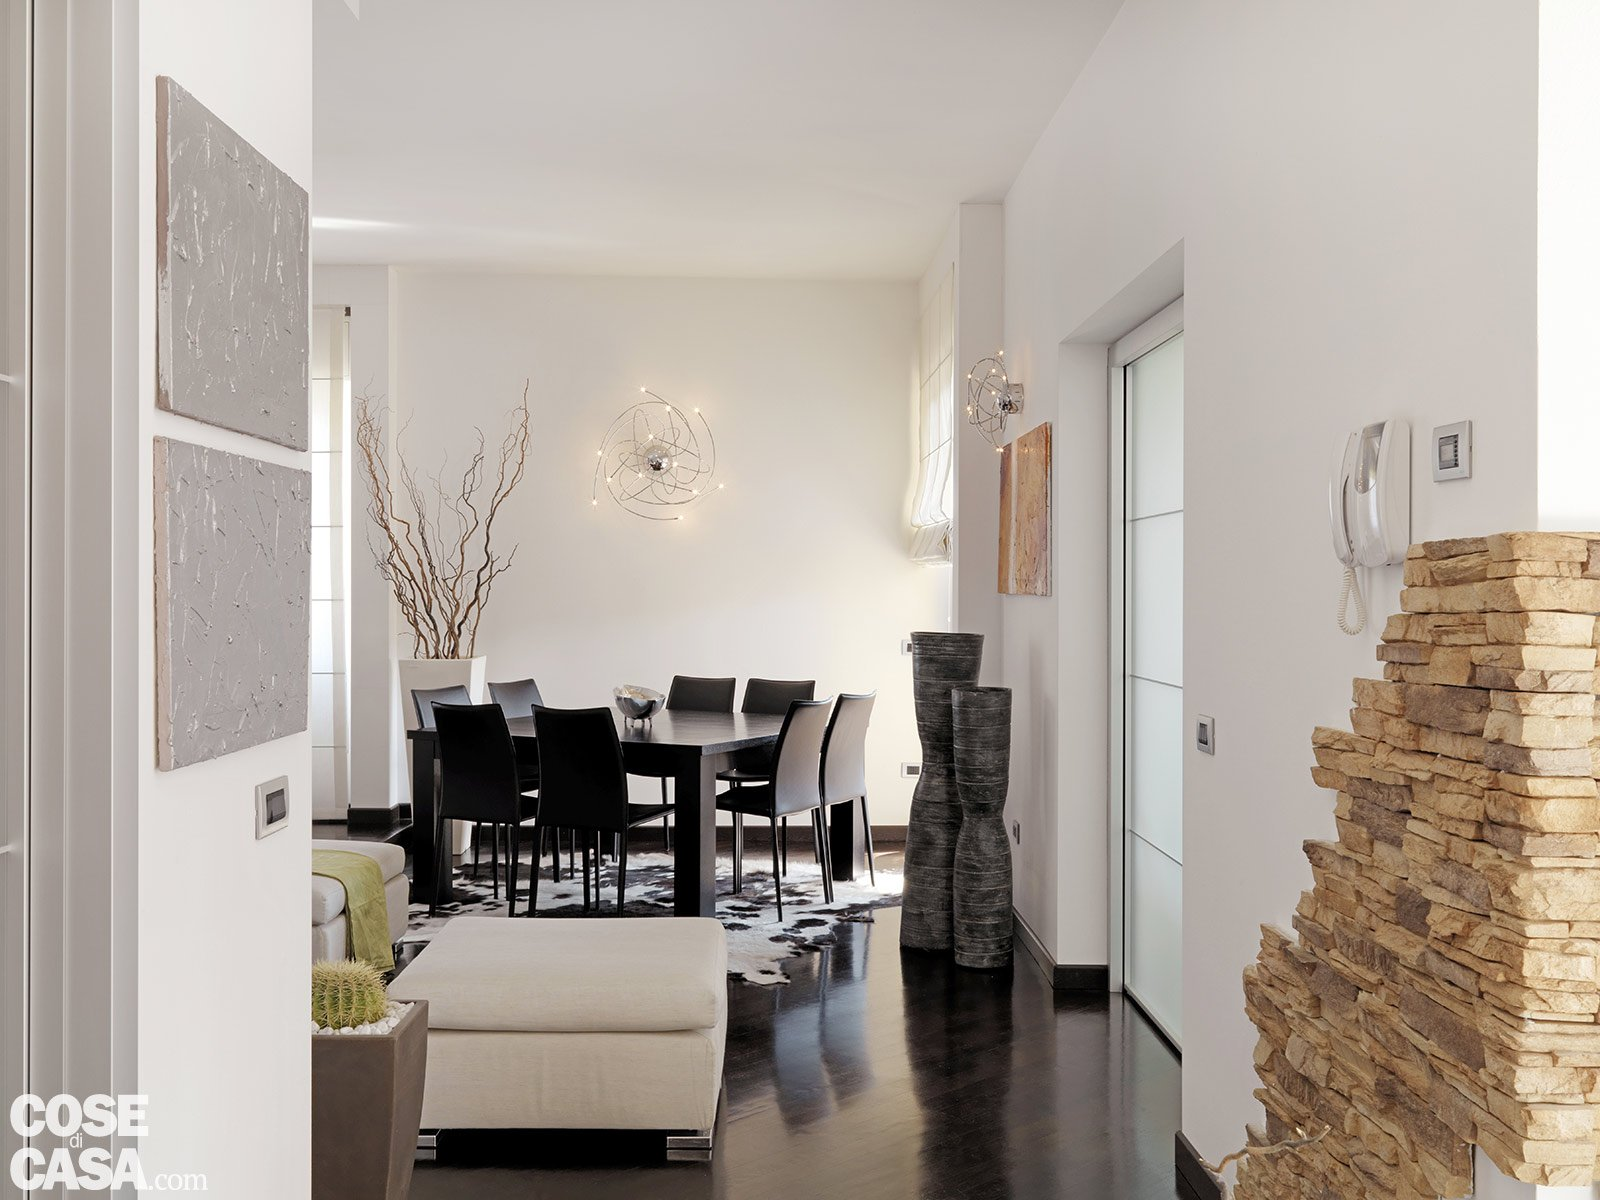 Una casa moderna su livelli sfalsati cose di casa for Disegni di casa italiana moderna